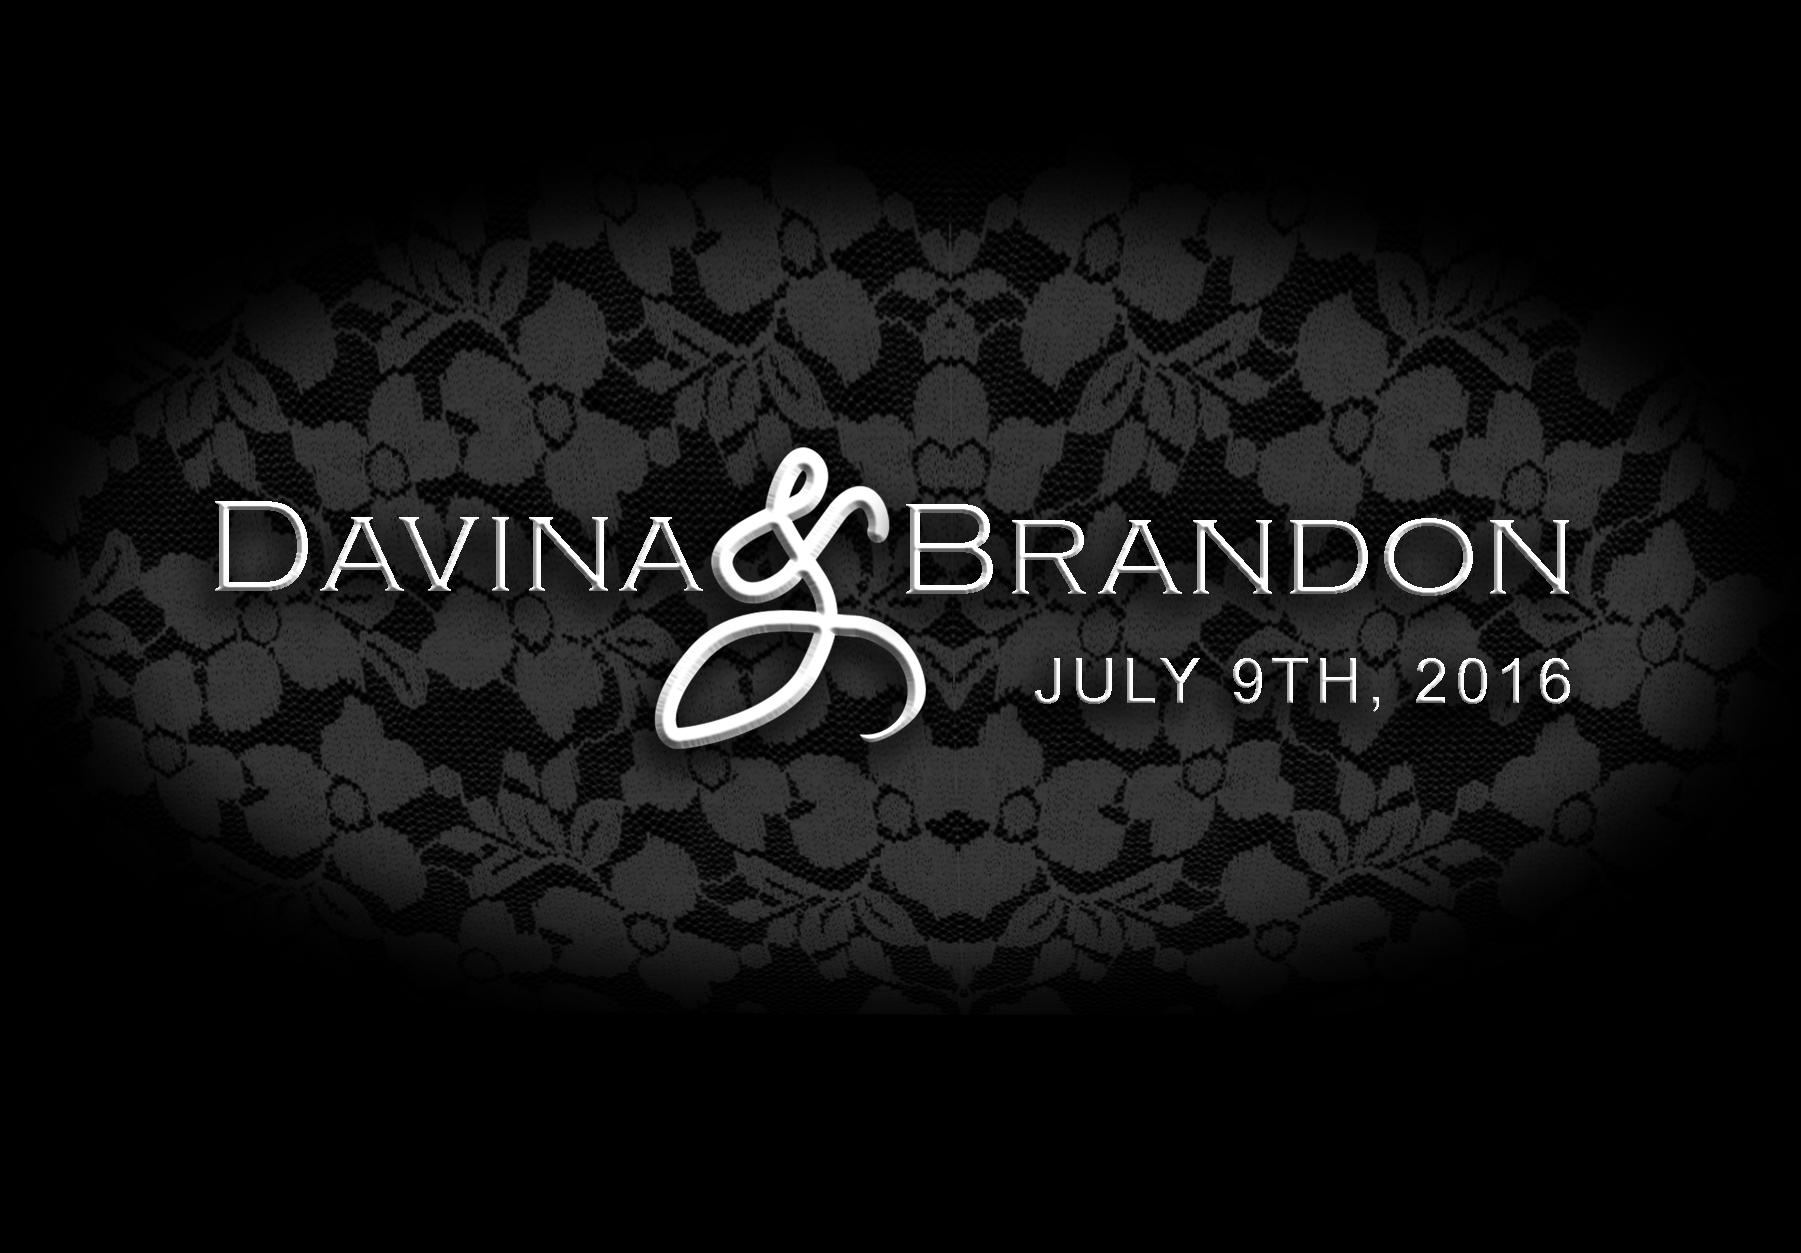 DAVINAandBRANDON4.jpg